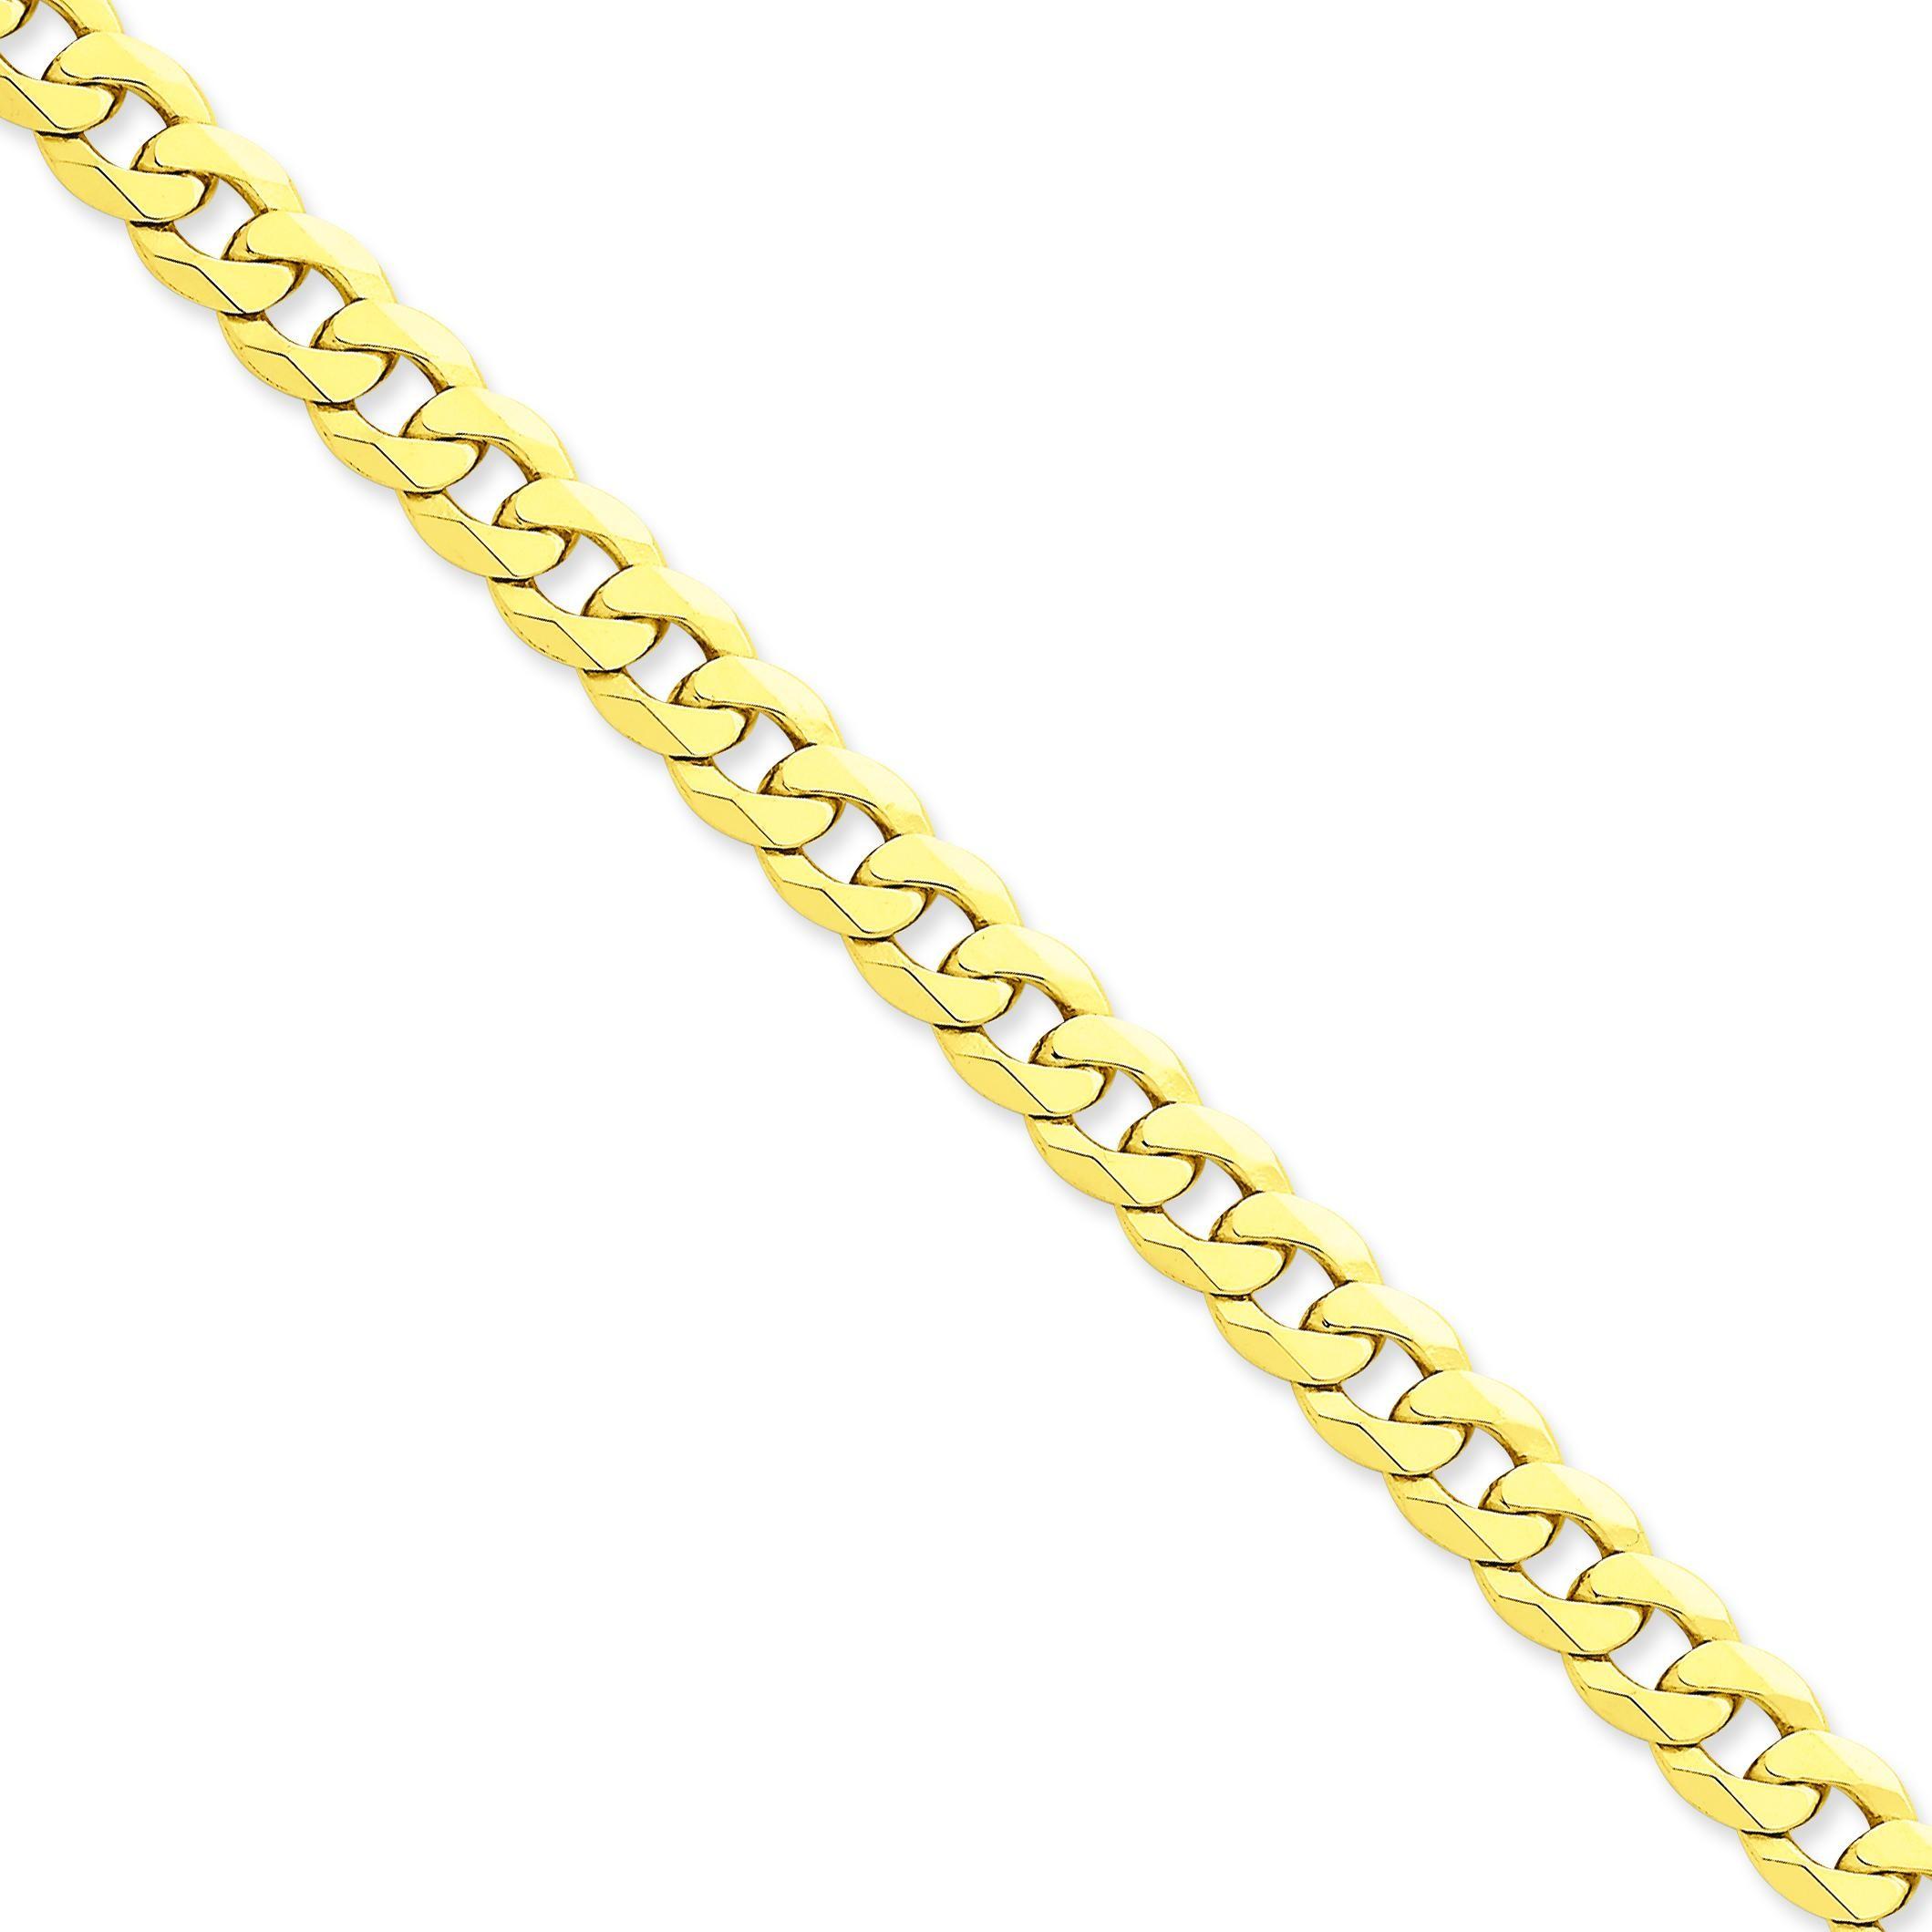 14k Yellow Gold 8 inch 8.00 mm Flat Beveled Curb Chain Bracelet